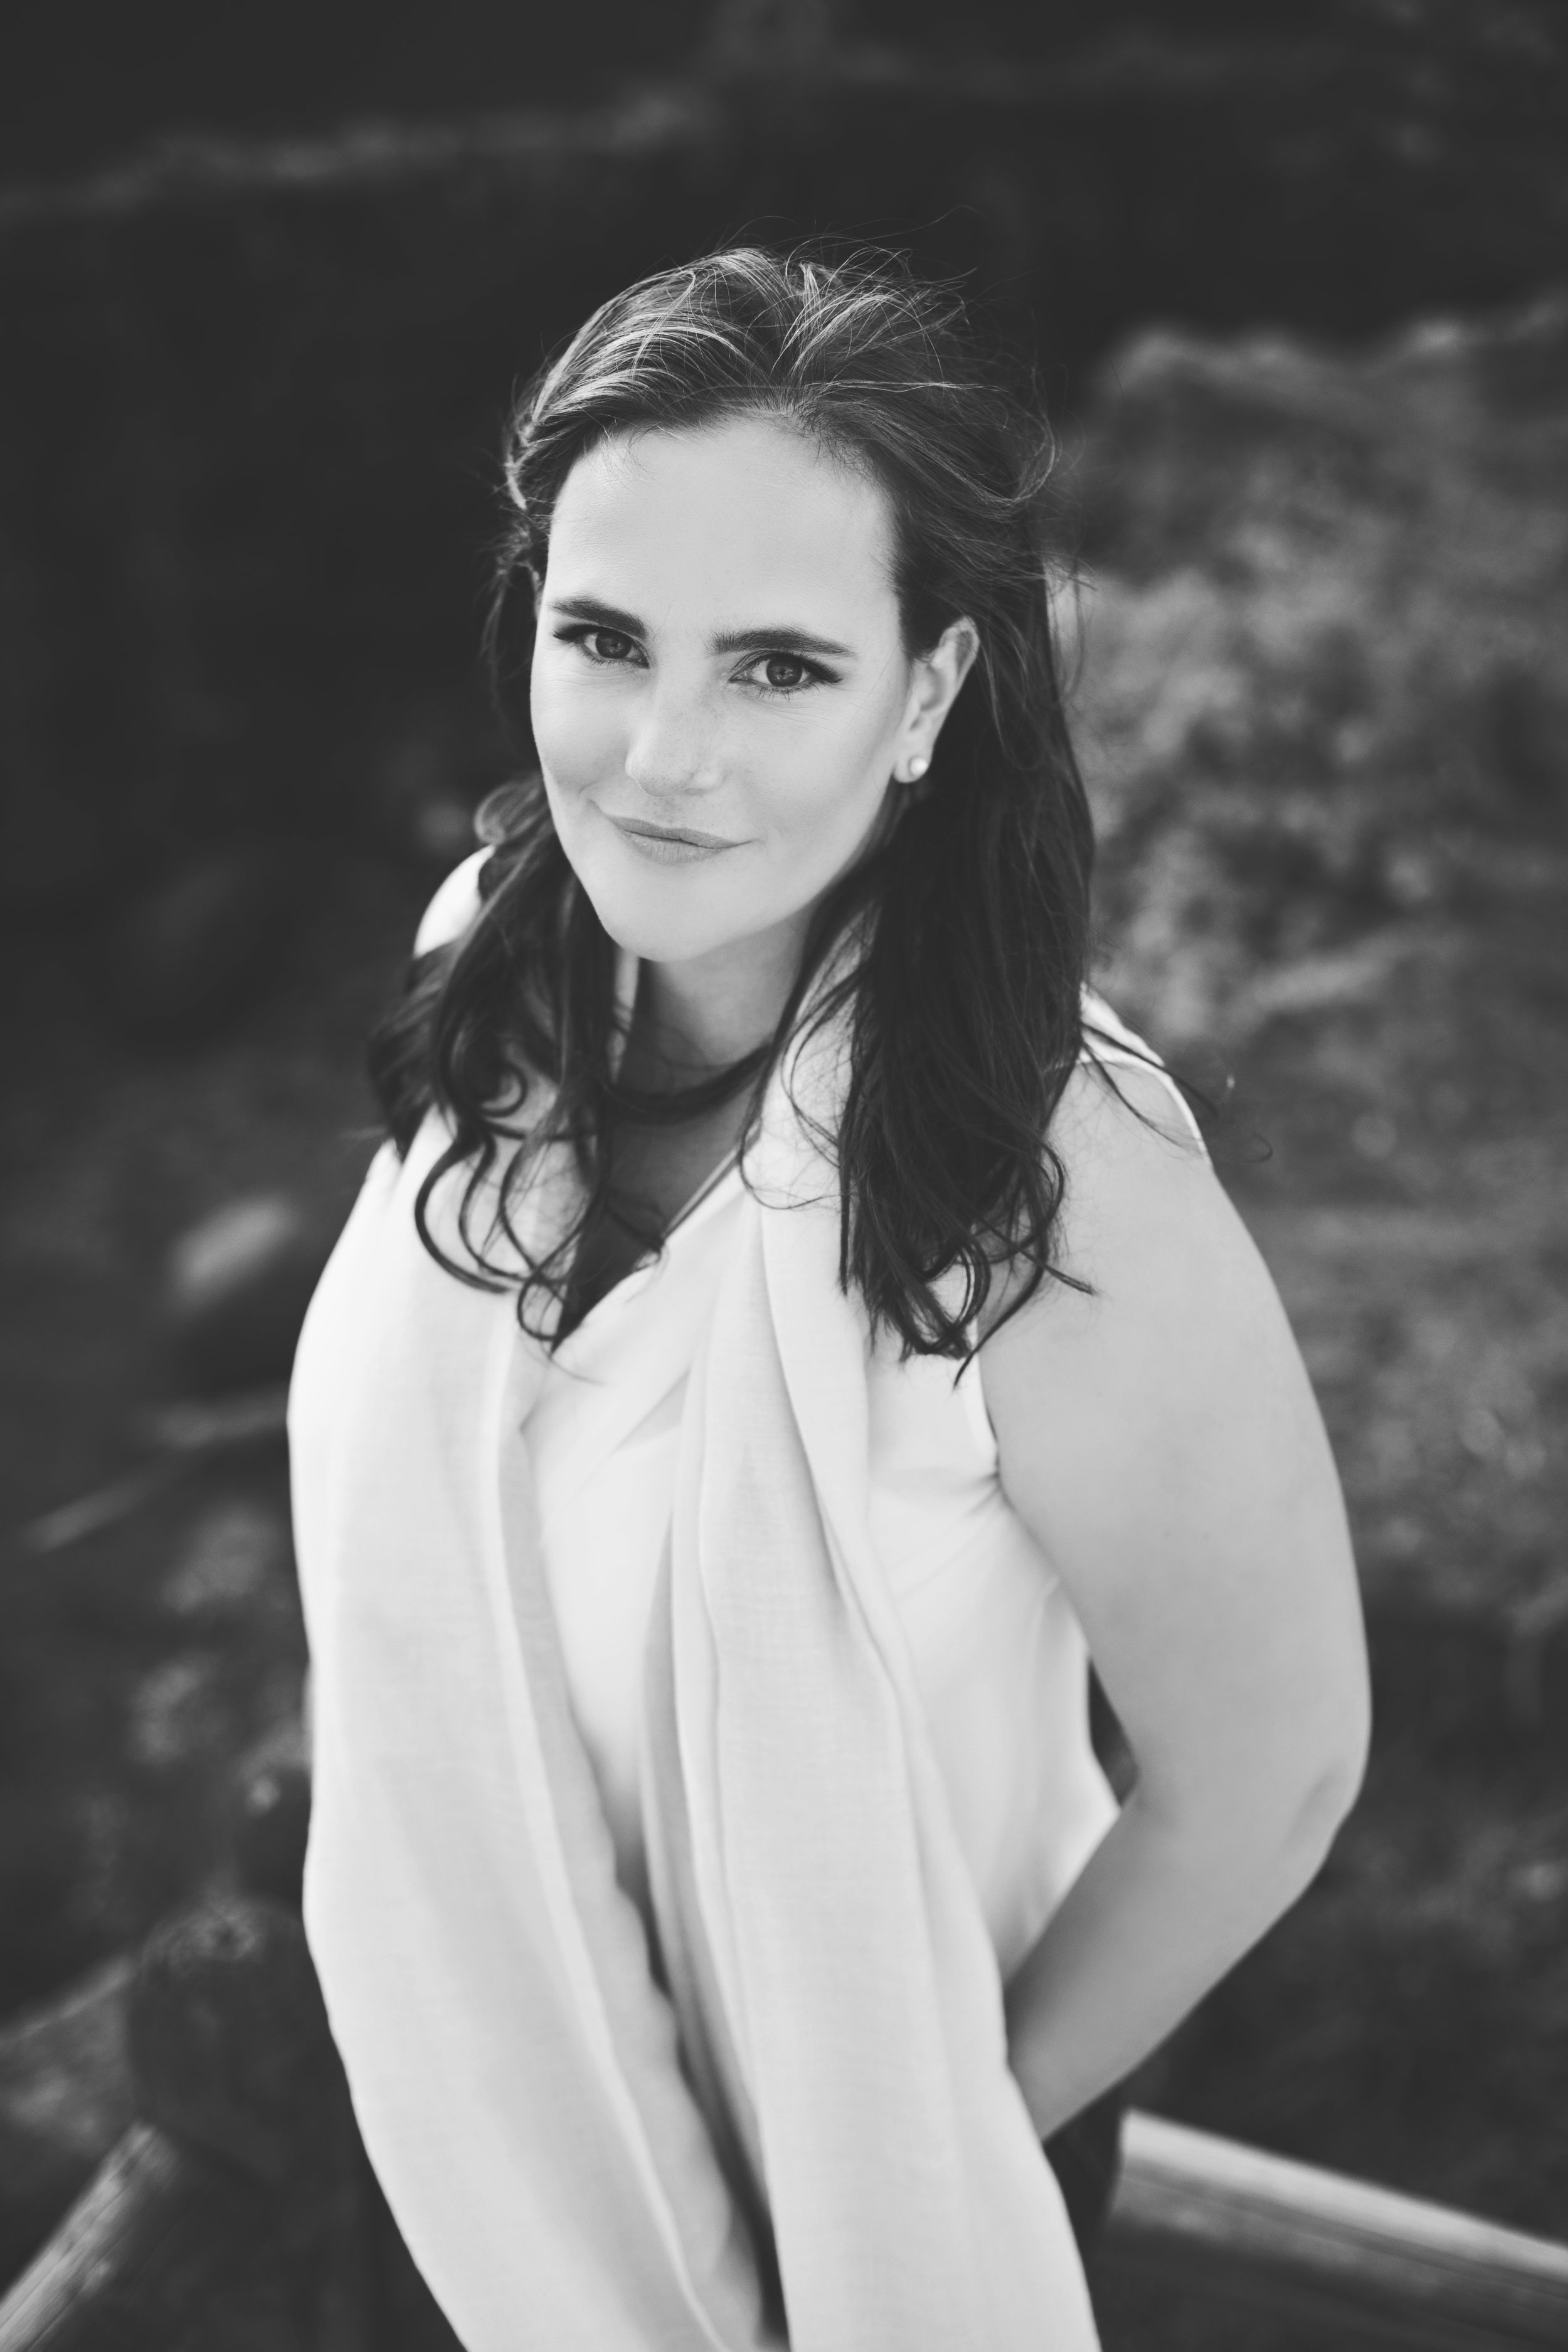 London based South African wedding planner Katrien